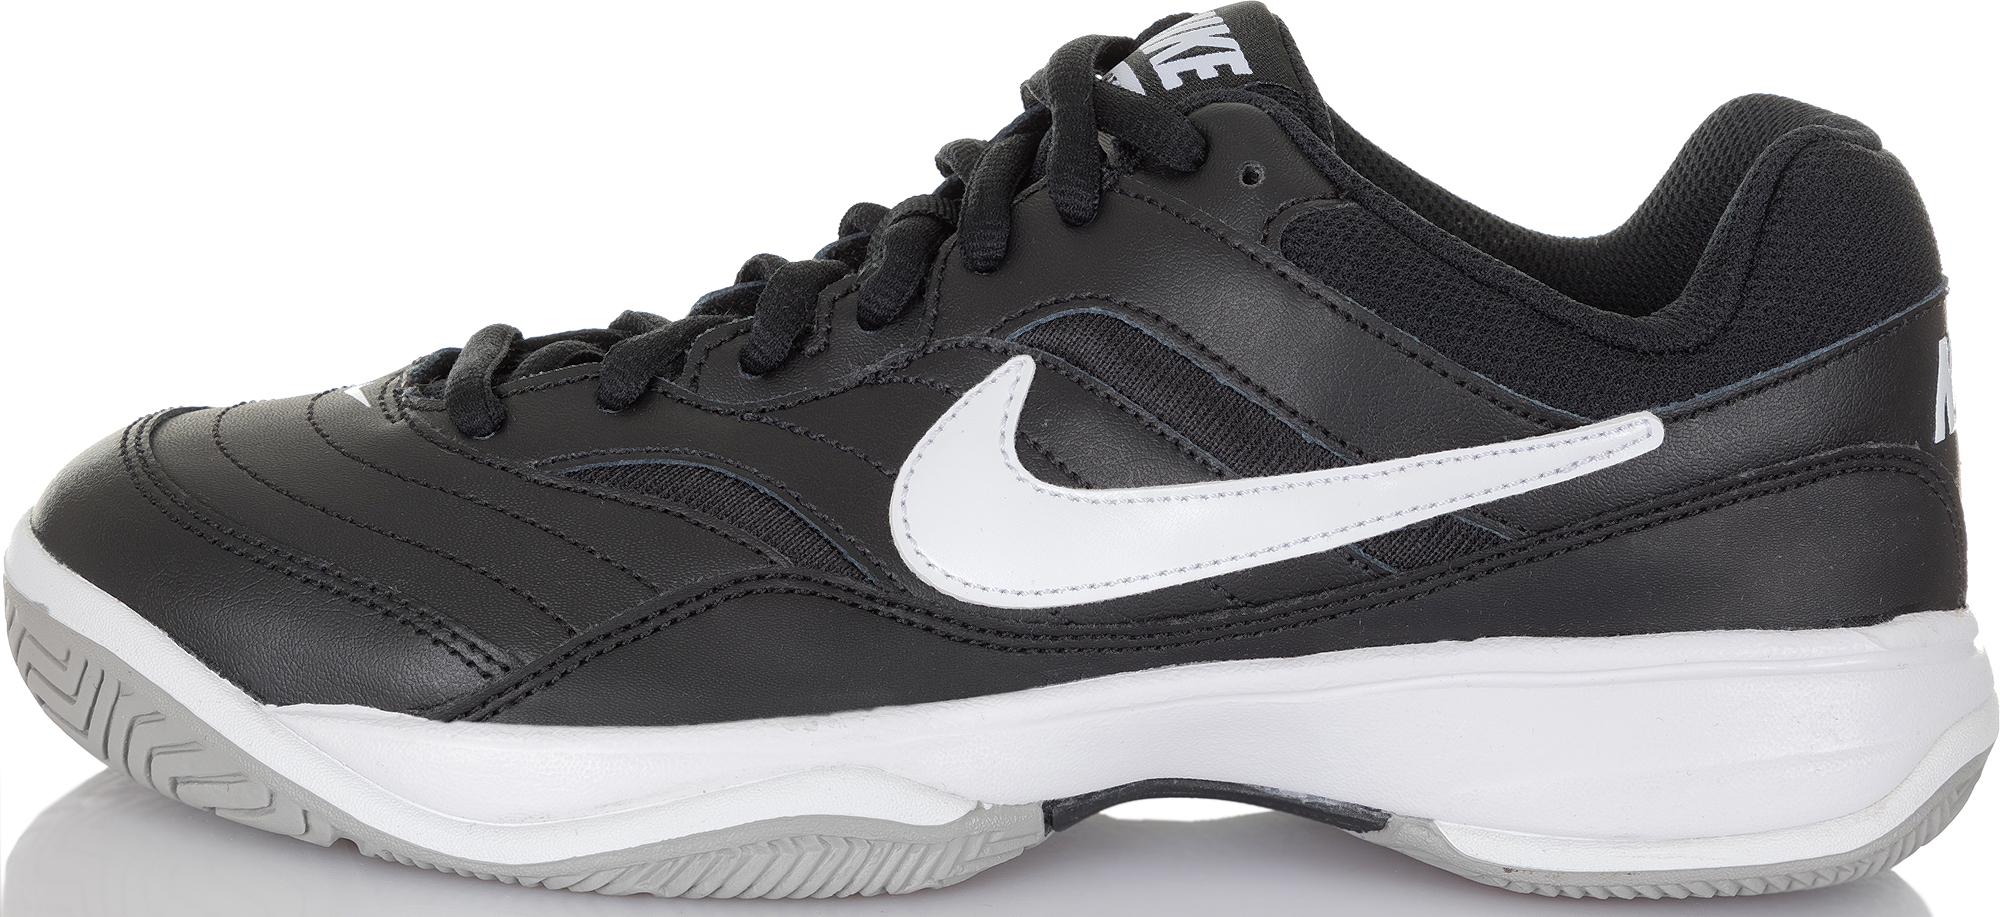 Nike Кроссовки мужские Nike Court Lite, размер 46,5 кроссовки для тенниса мужские nike court lite цвет белый 845021 100 размер 10 5 43 5